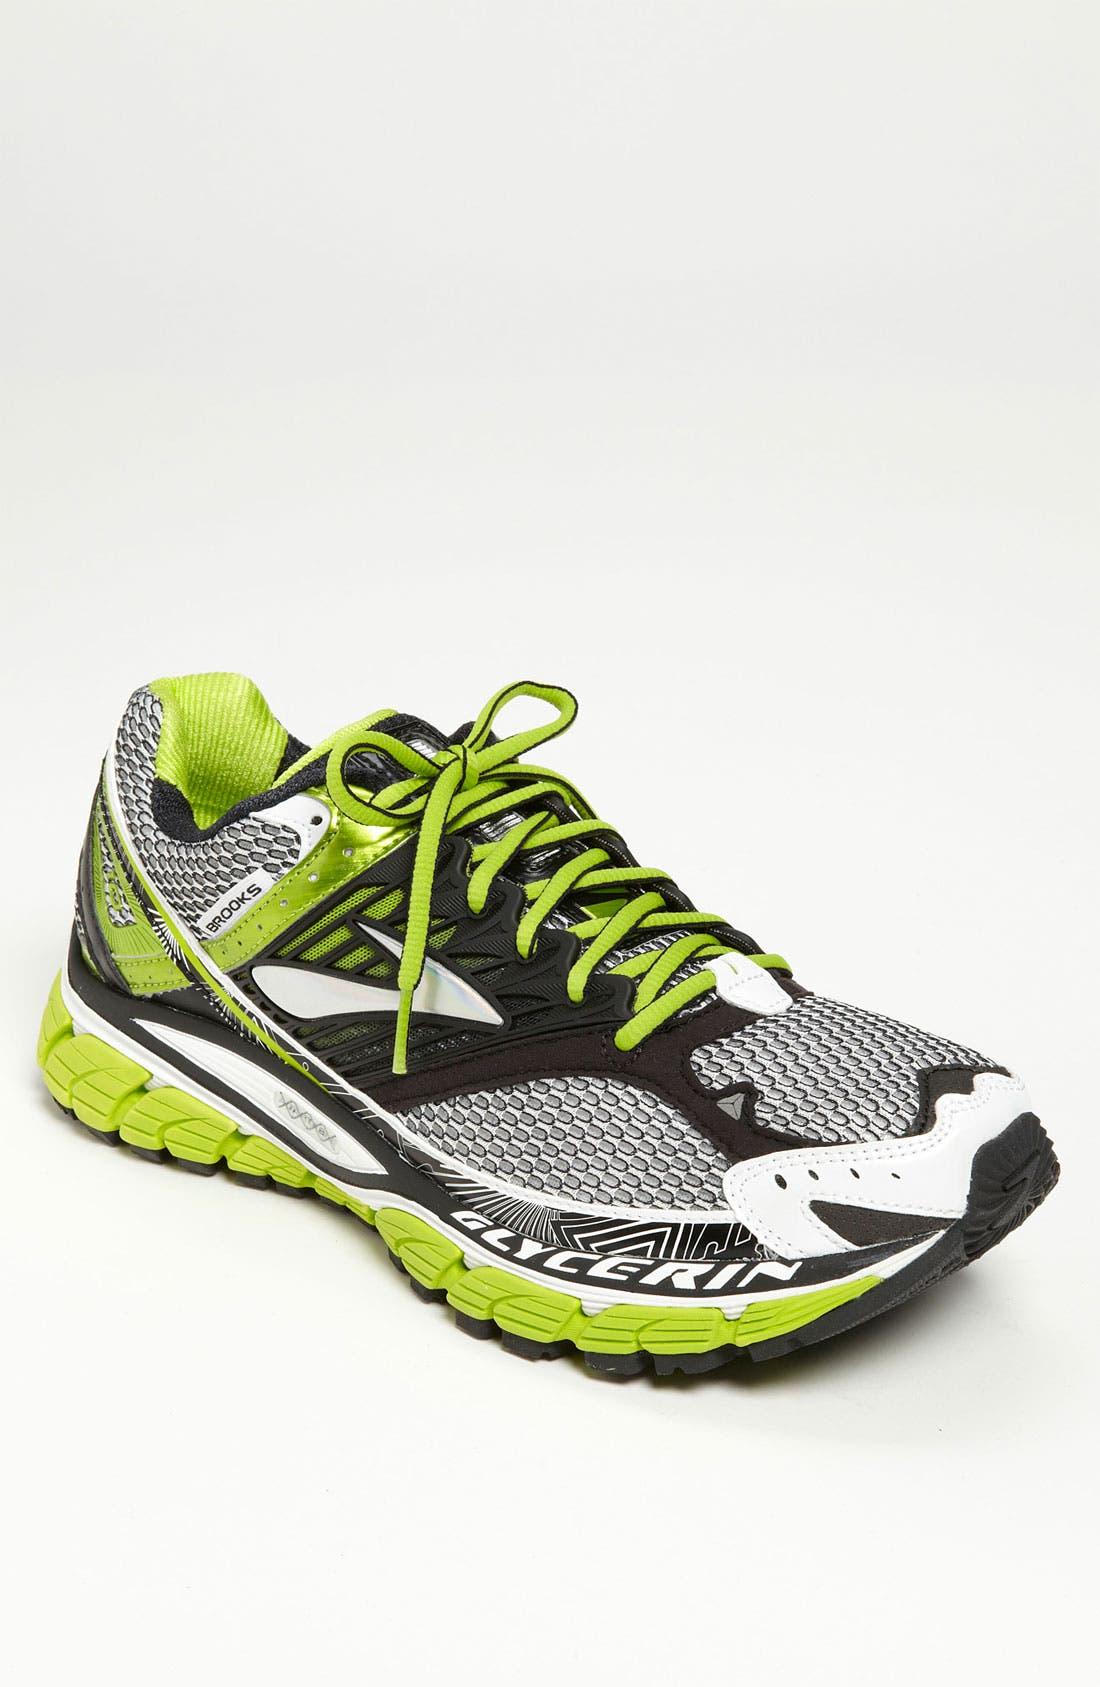 Alternate Image 1 Selected - Brooks 'Glycerin 10' Running Shoe (Men)